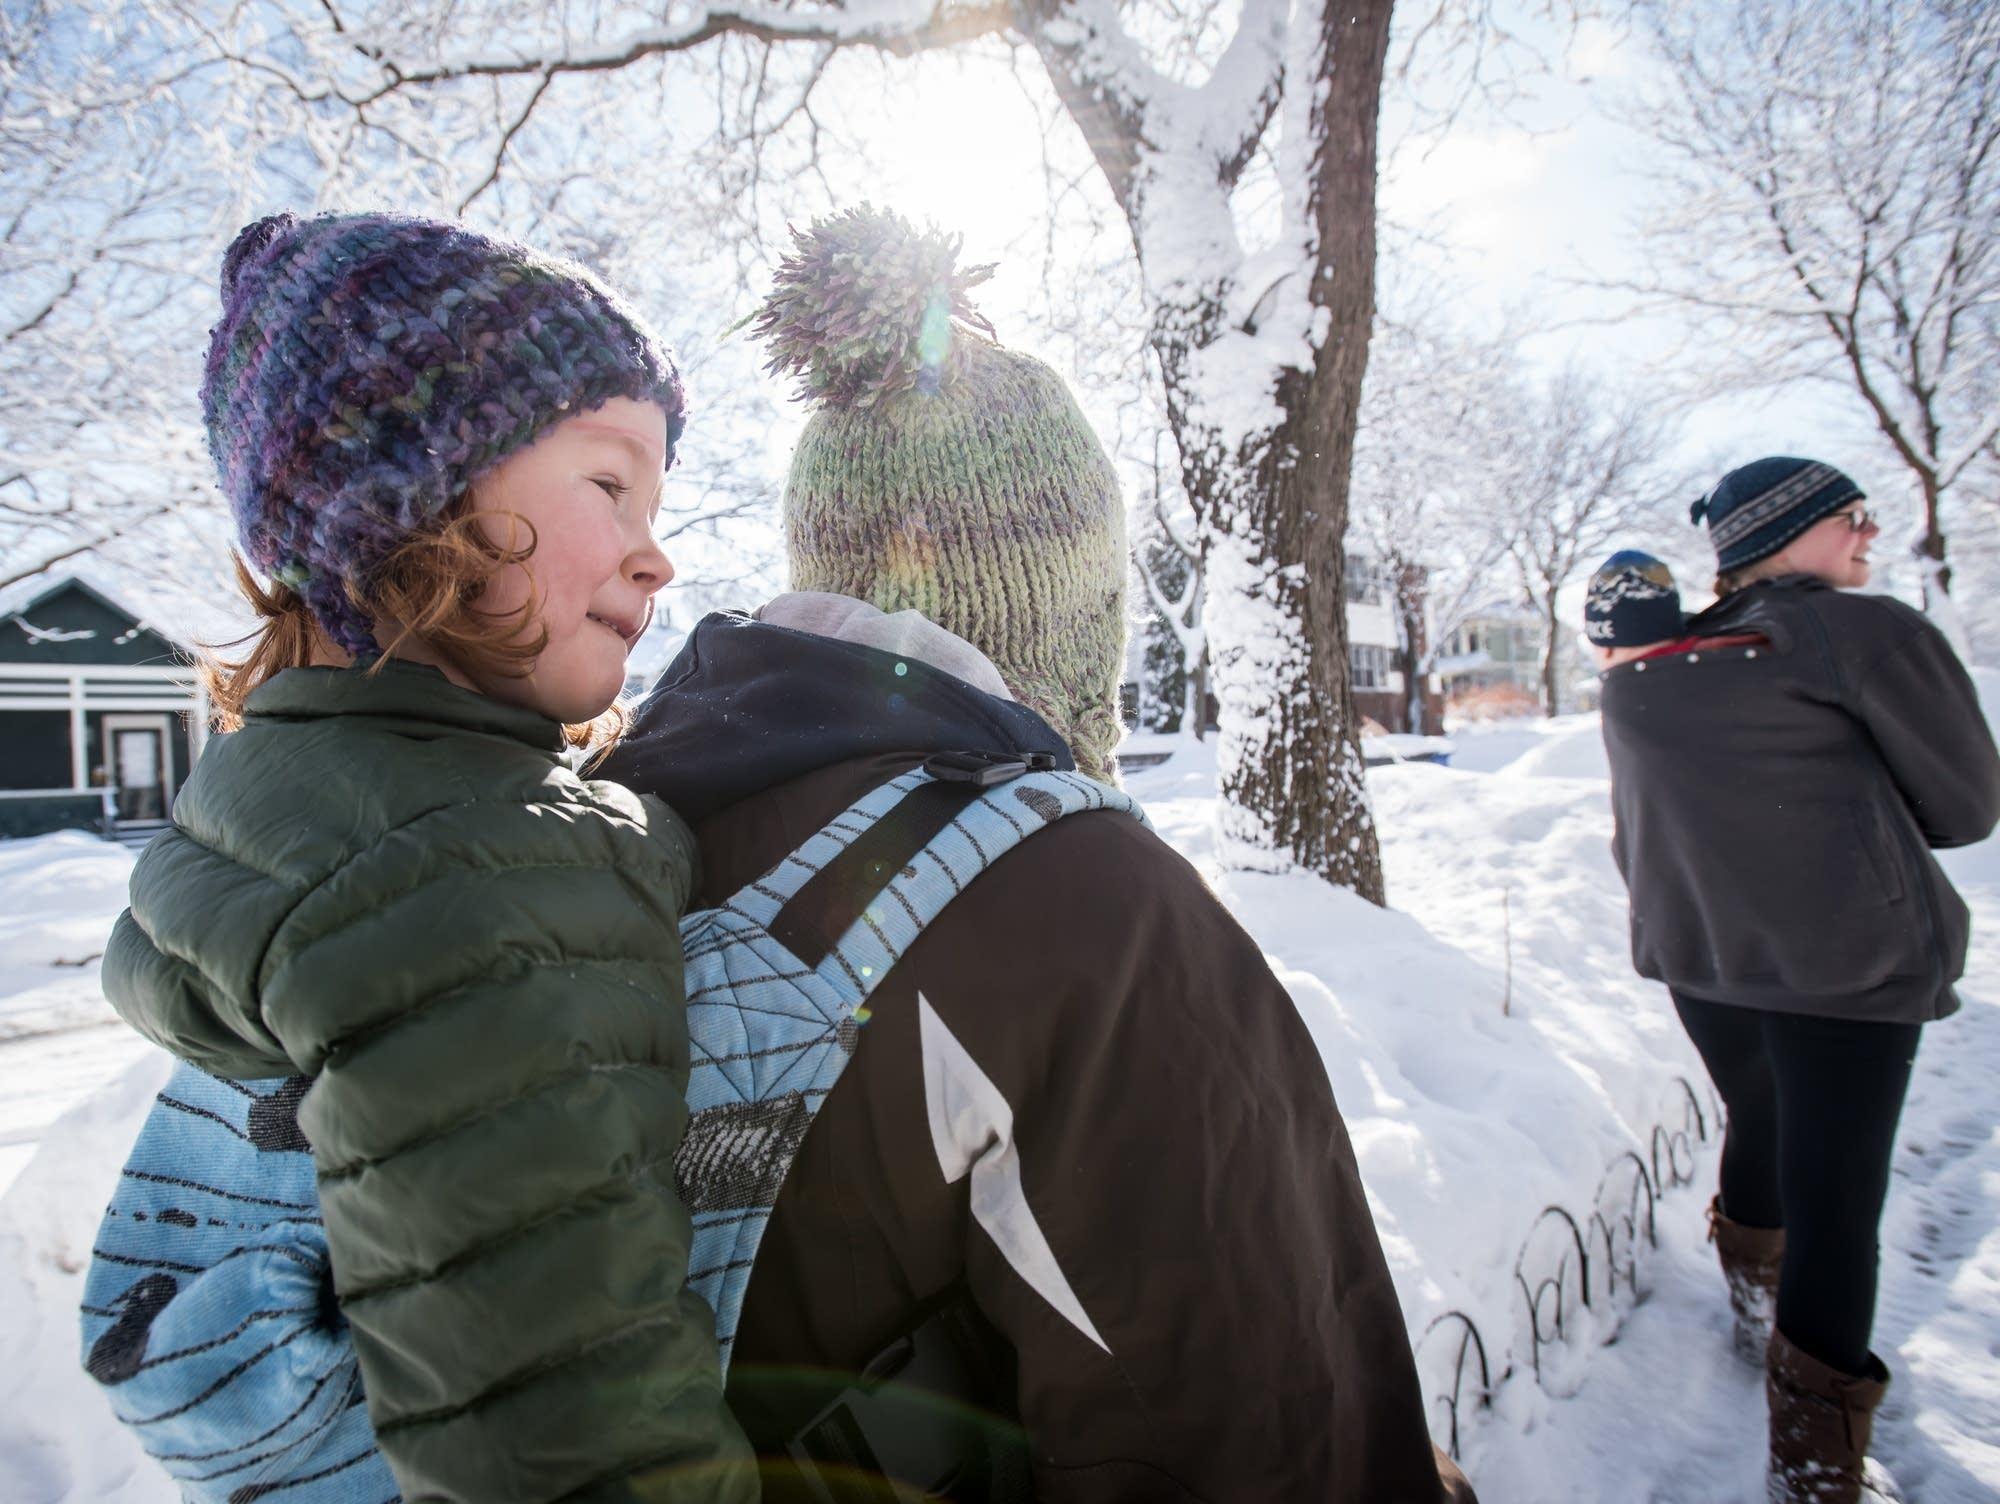 Grace Blanchard-Hinz, 4, rides on her mom Colleen Hinz's back